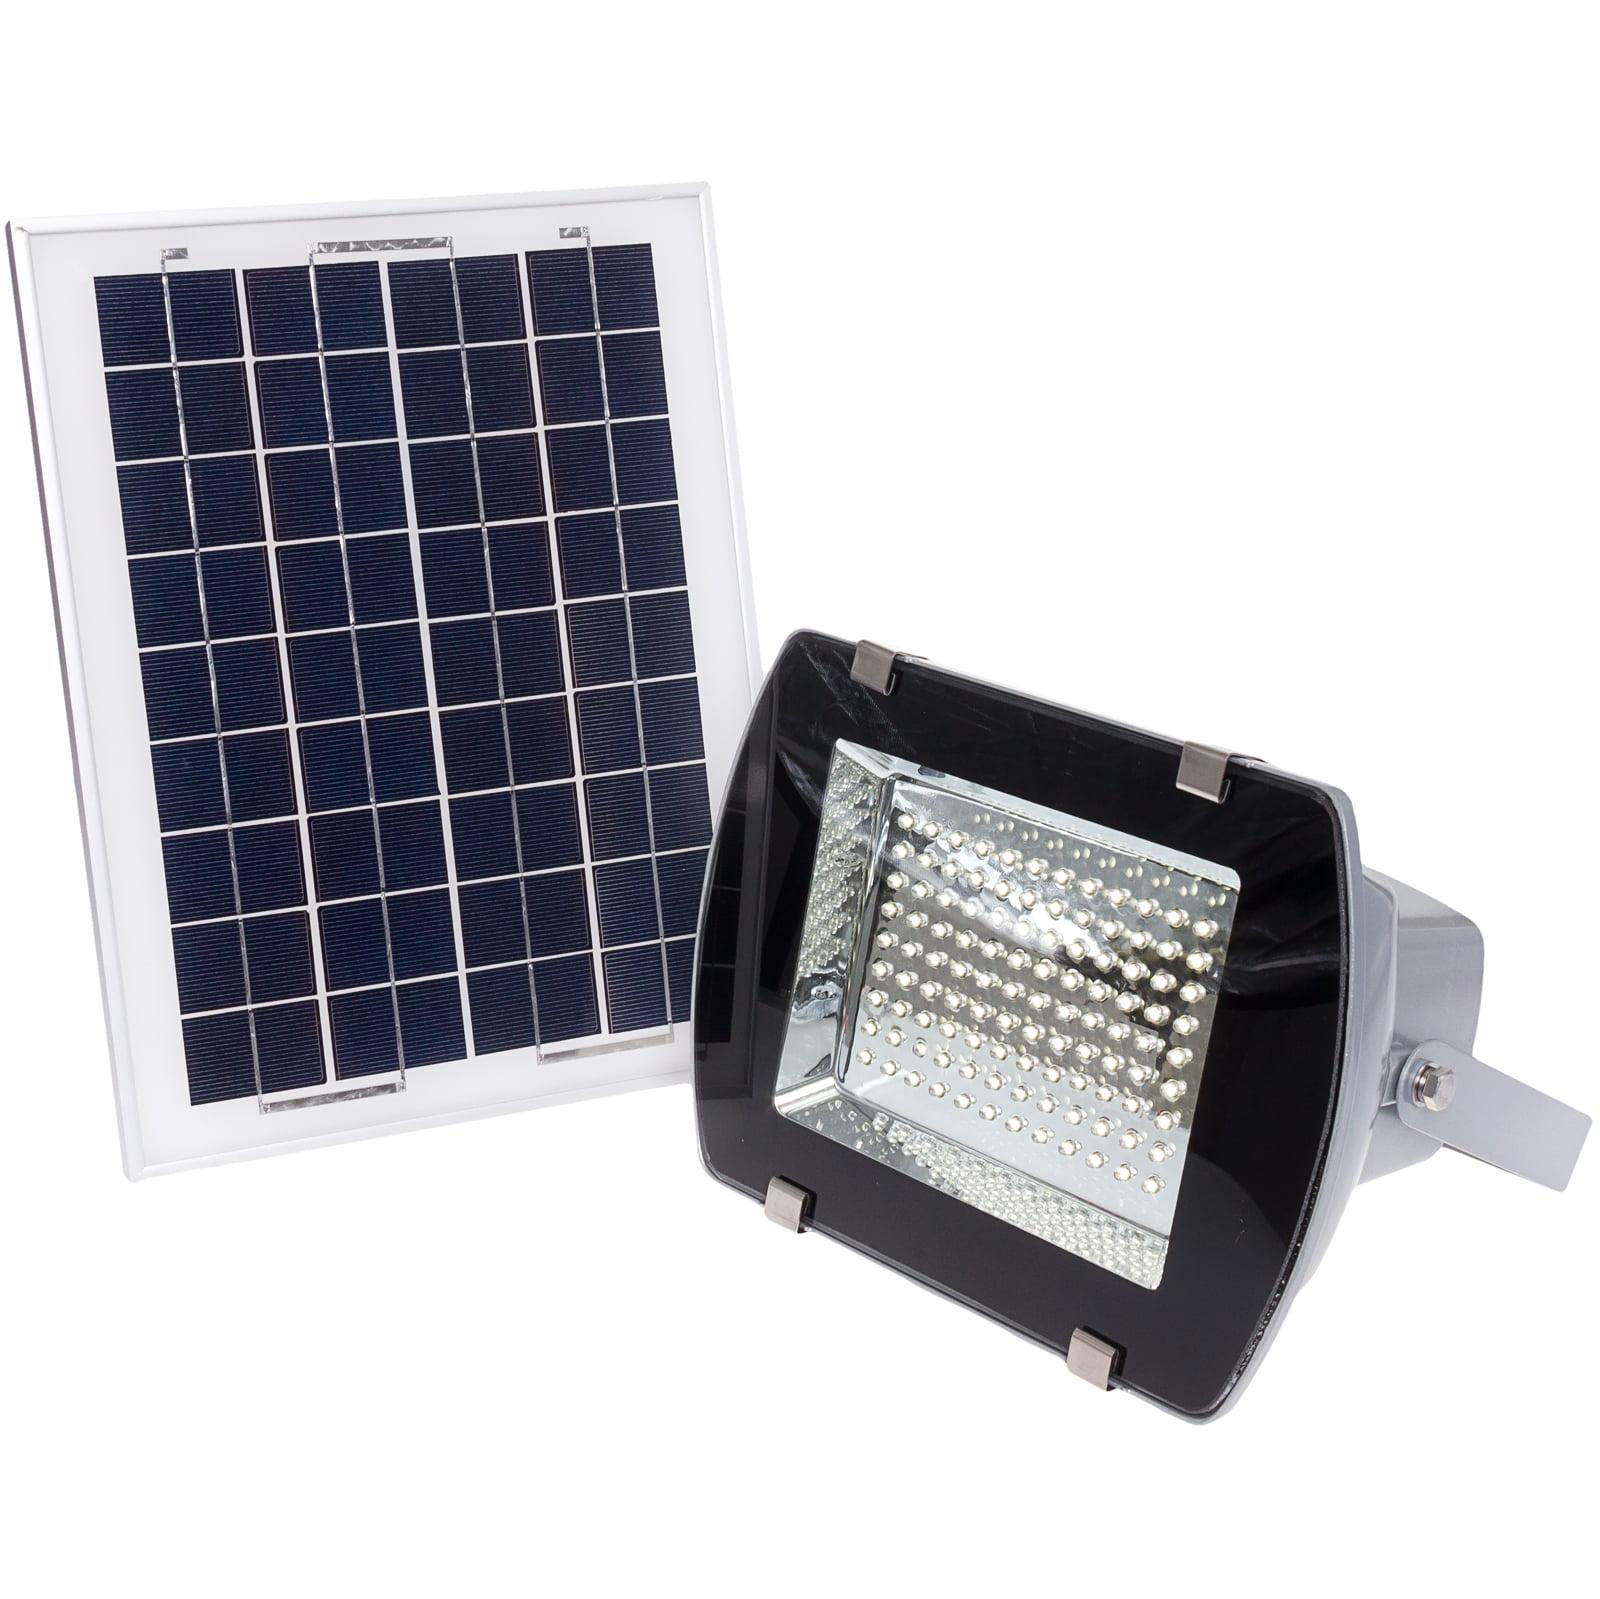 108 LED Outdoor Solar Powered Wall Mount Flood Light